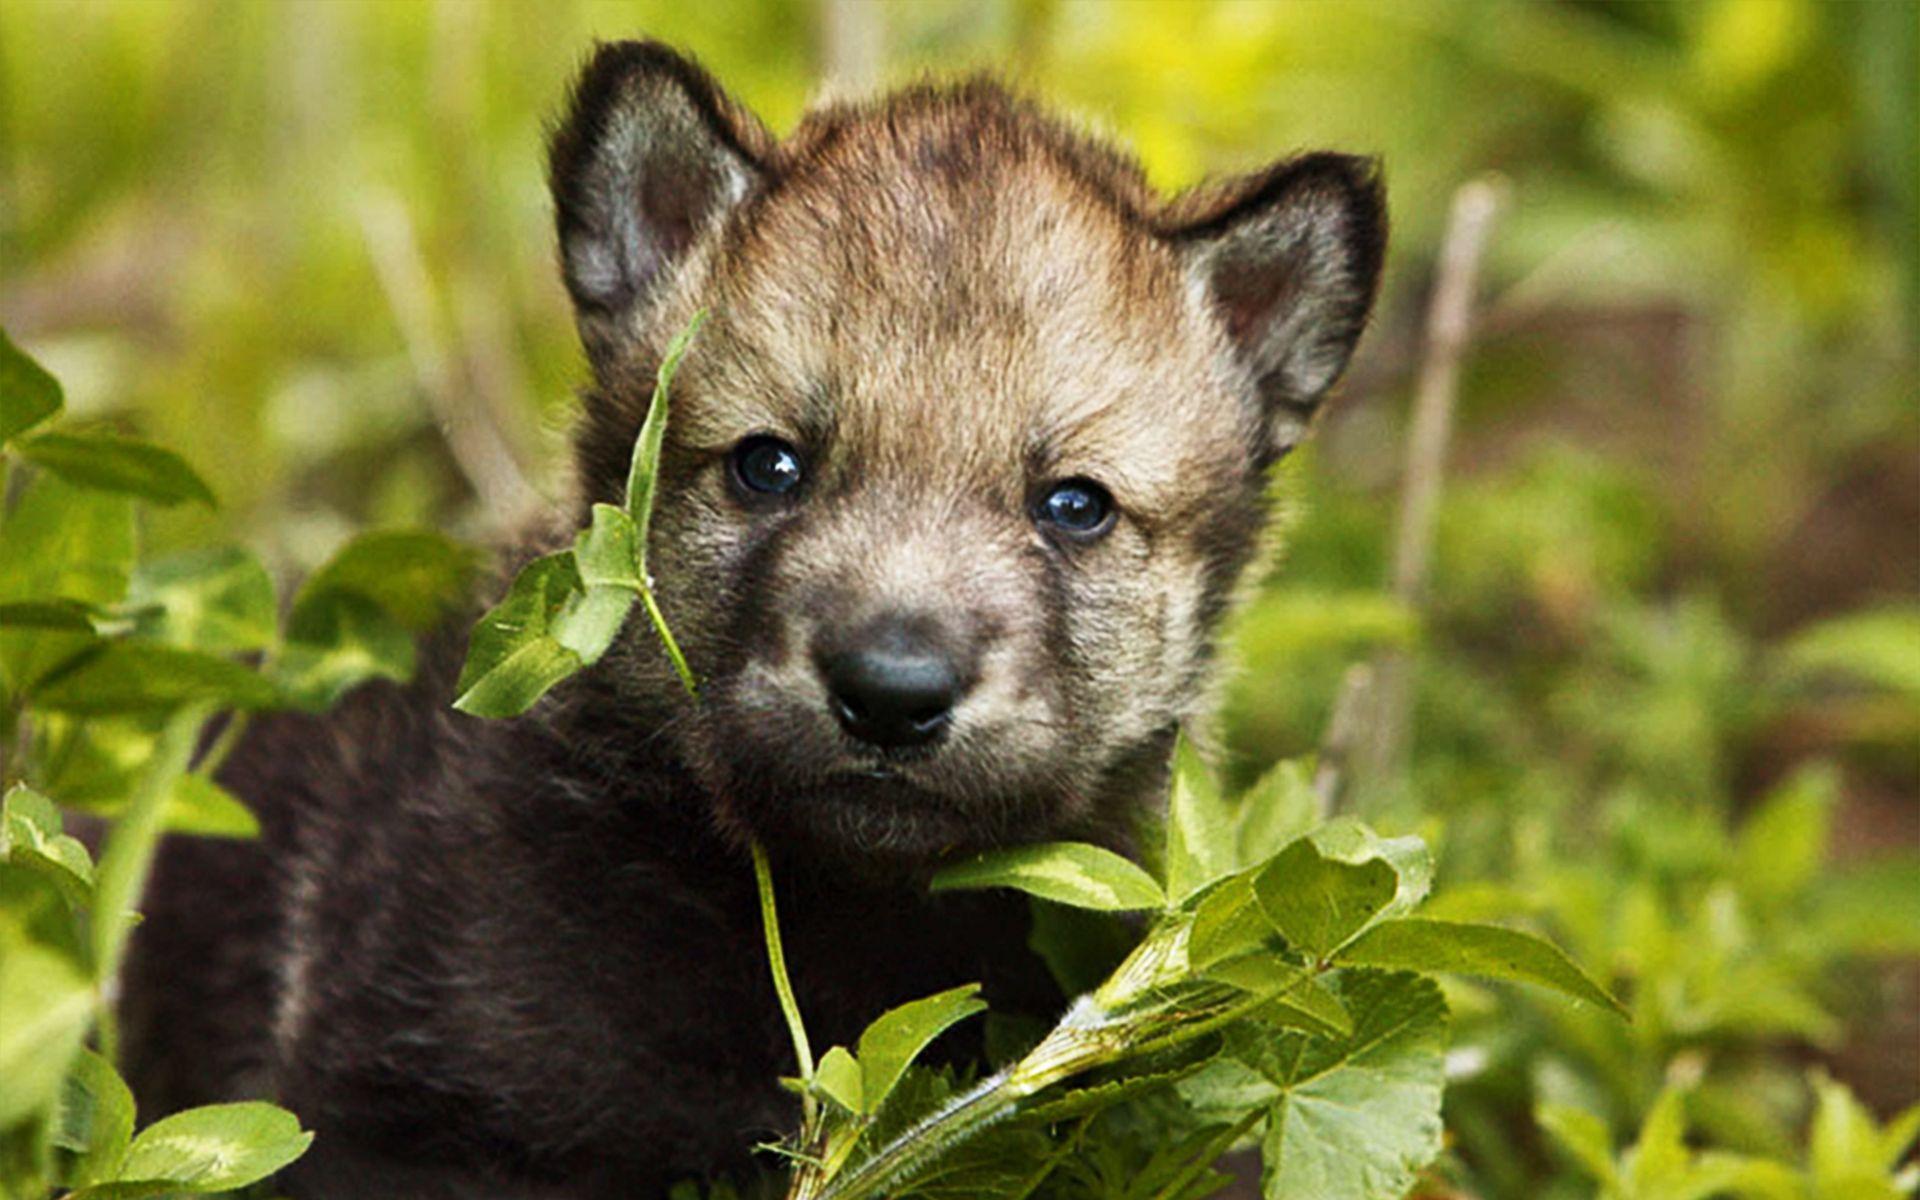 Imagenes De Lobo Para Fondo De Pantalla: Animales Lobo Fondo De Pantalla